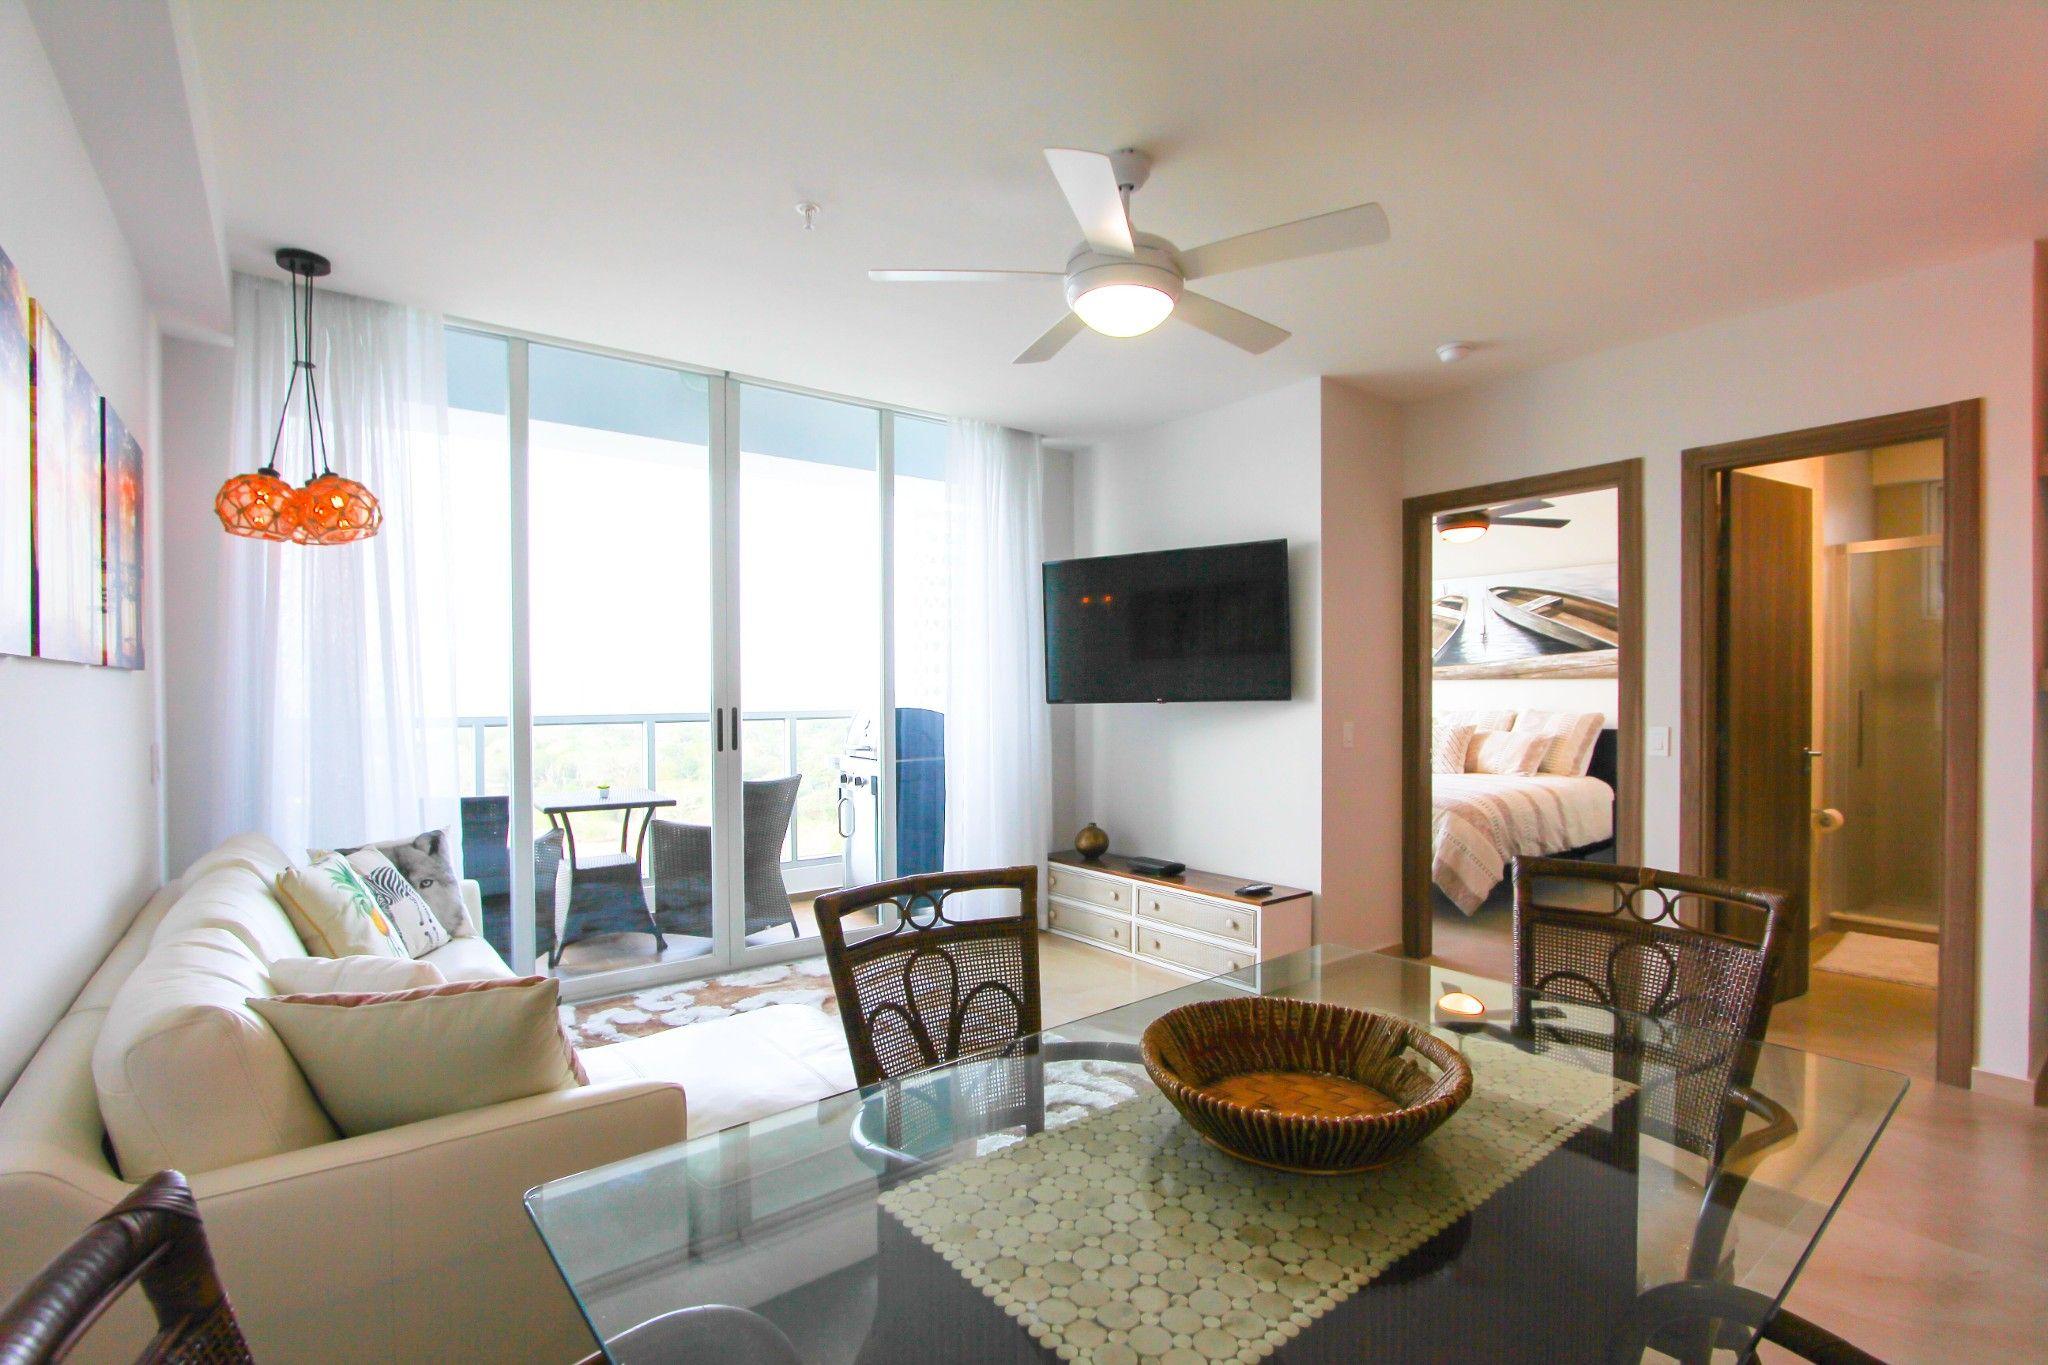 Main Photo: PH Royal Palm Resale - One Bedroom